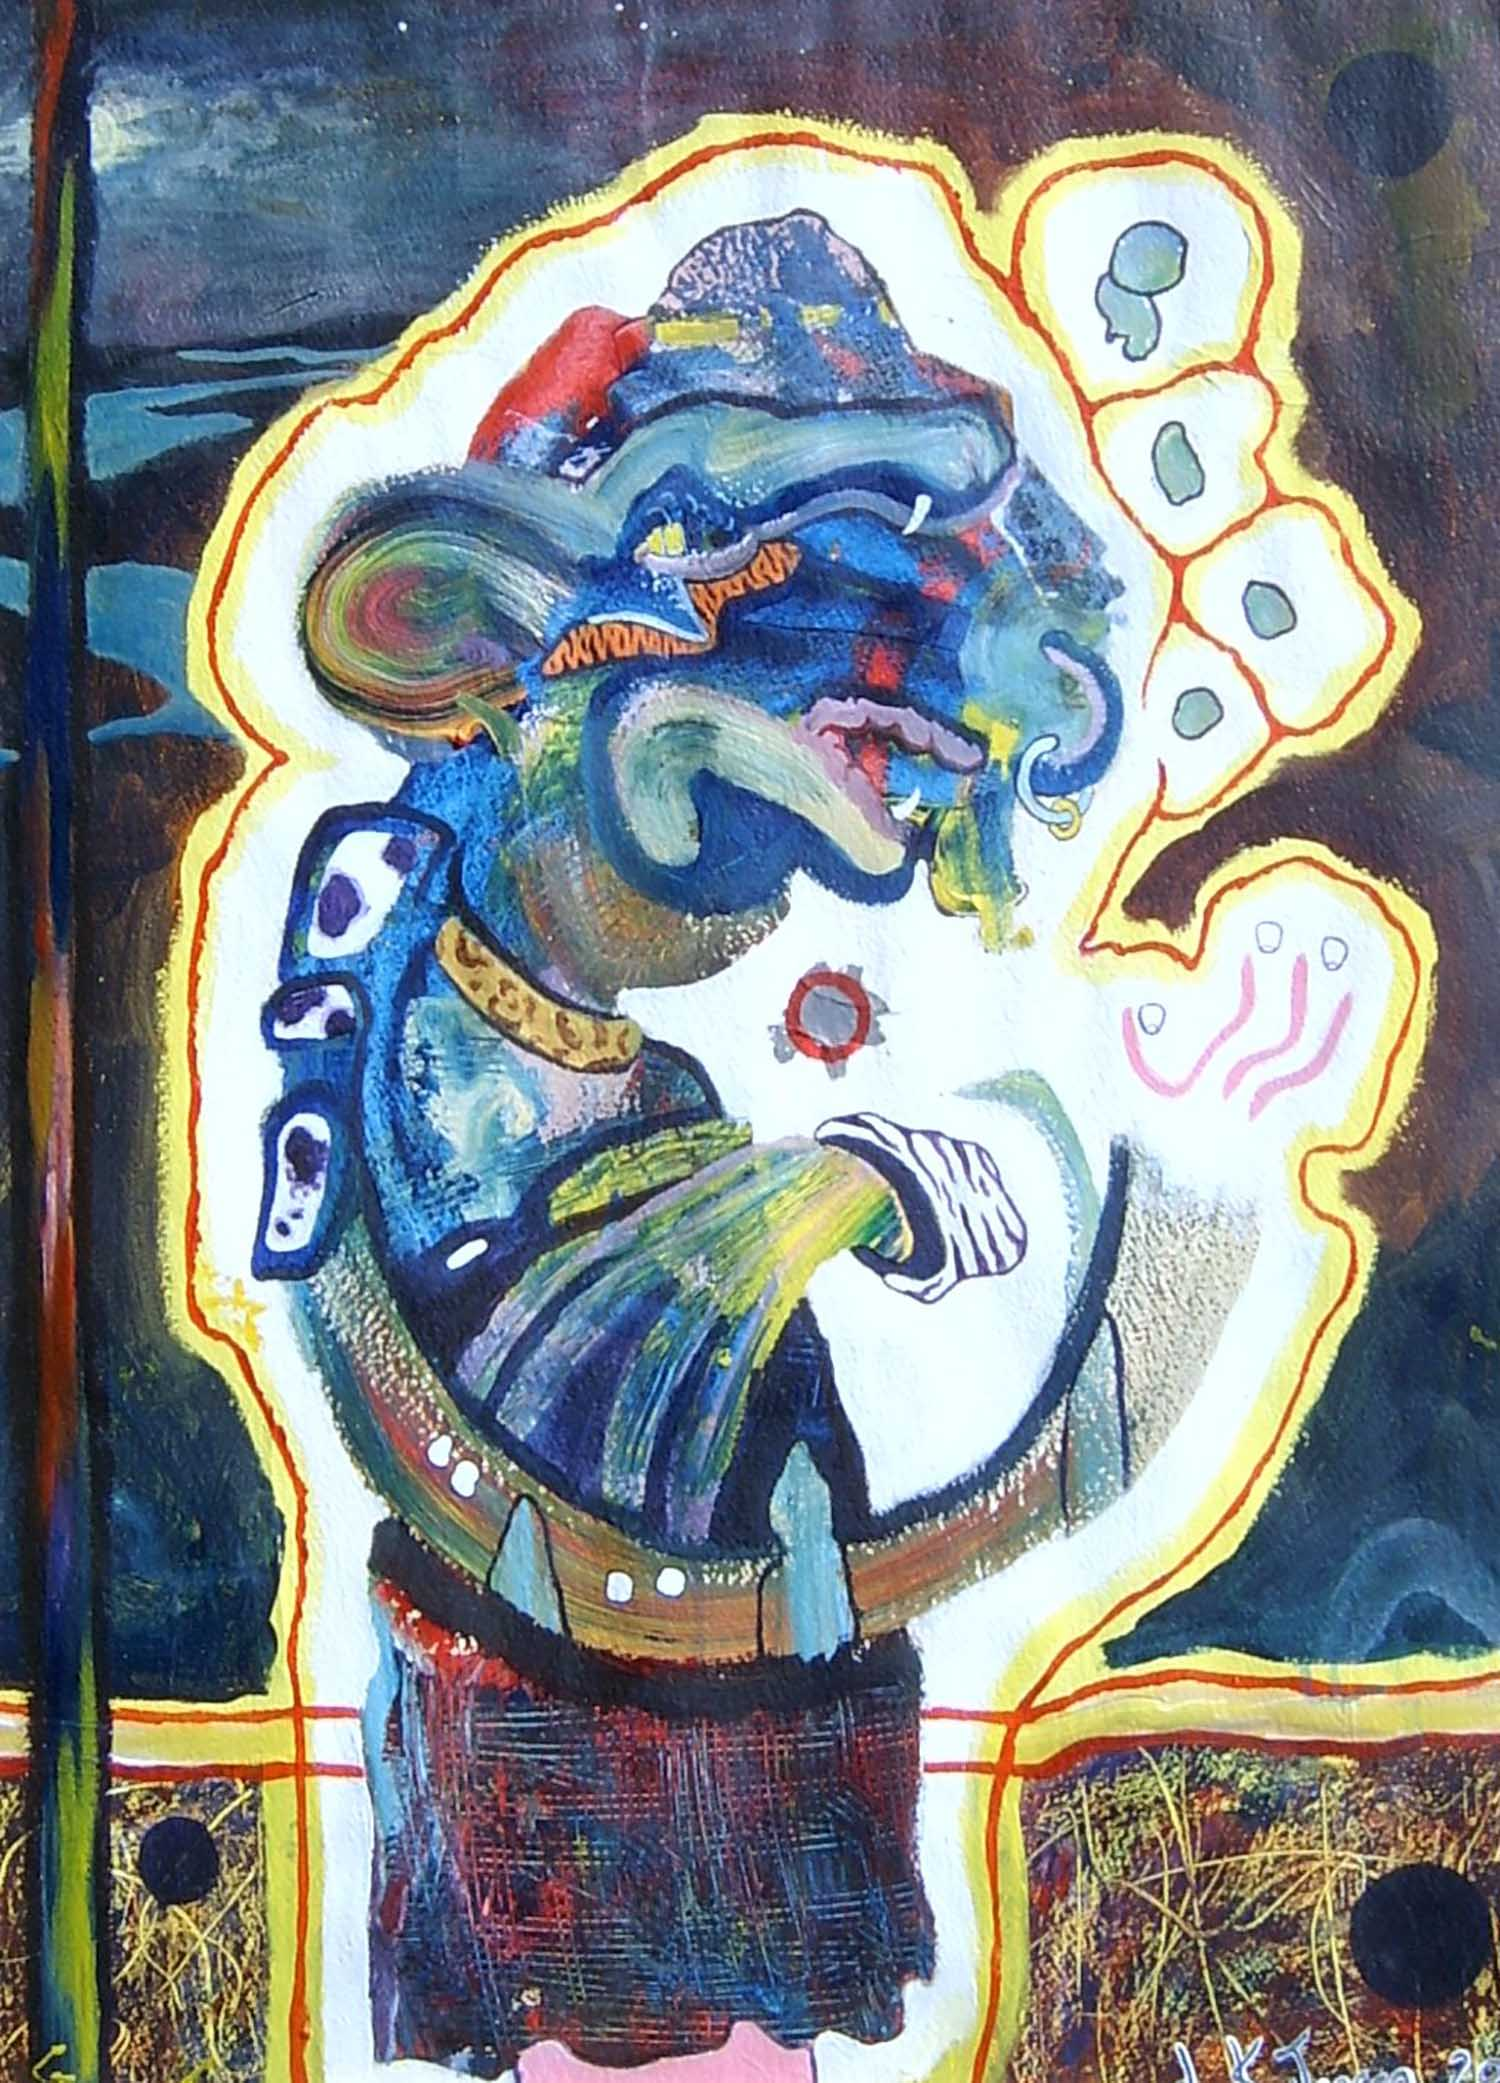 Rollands Kilt. acrylic on canvas. 70x60cm.1500ppi.4web